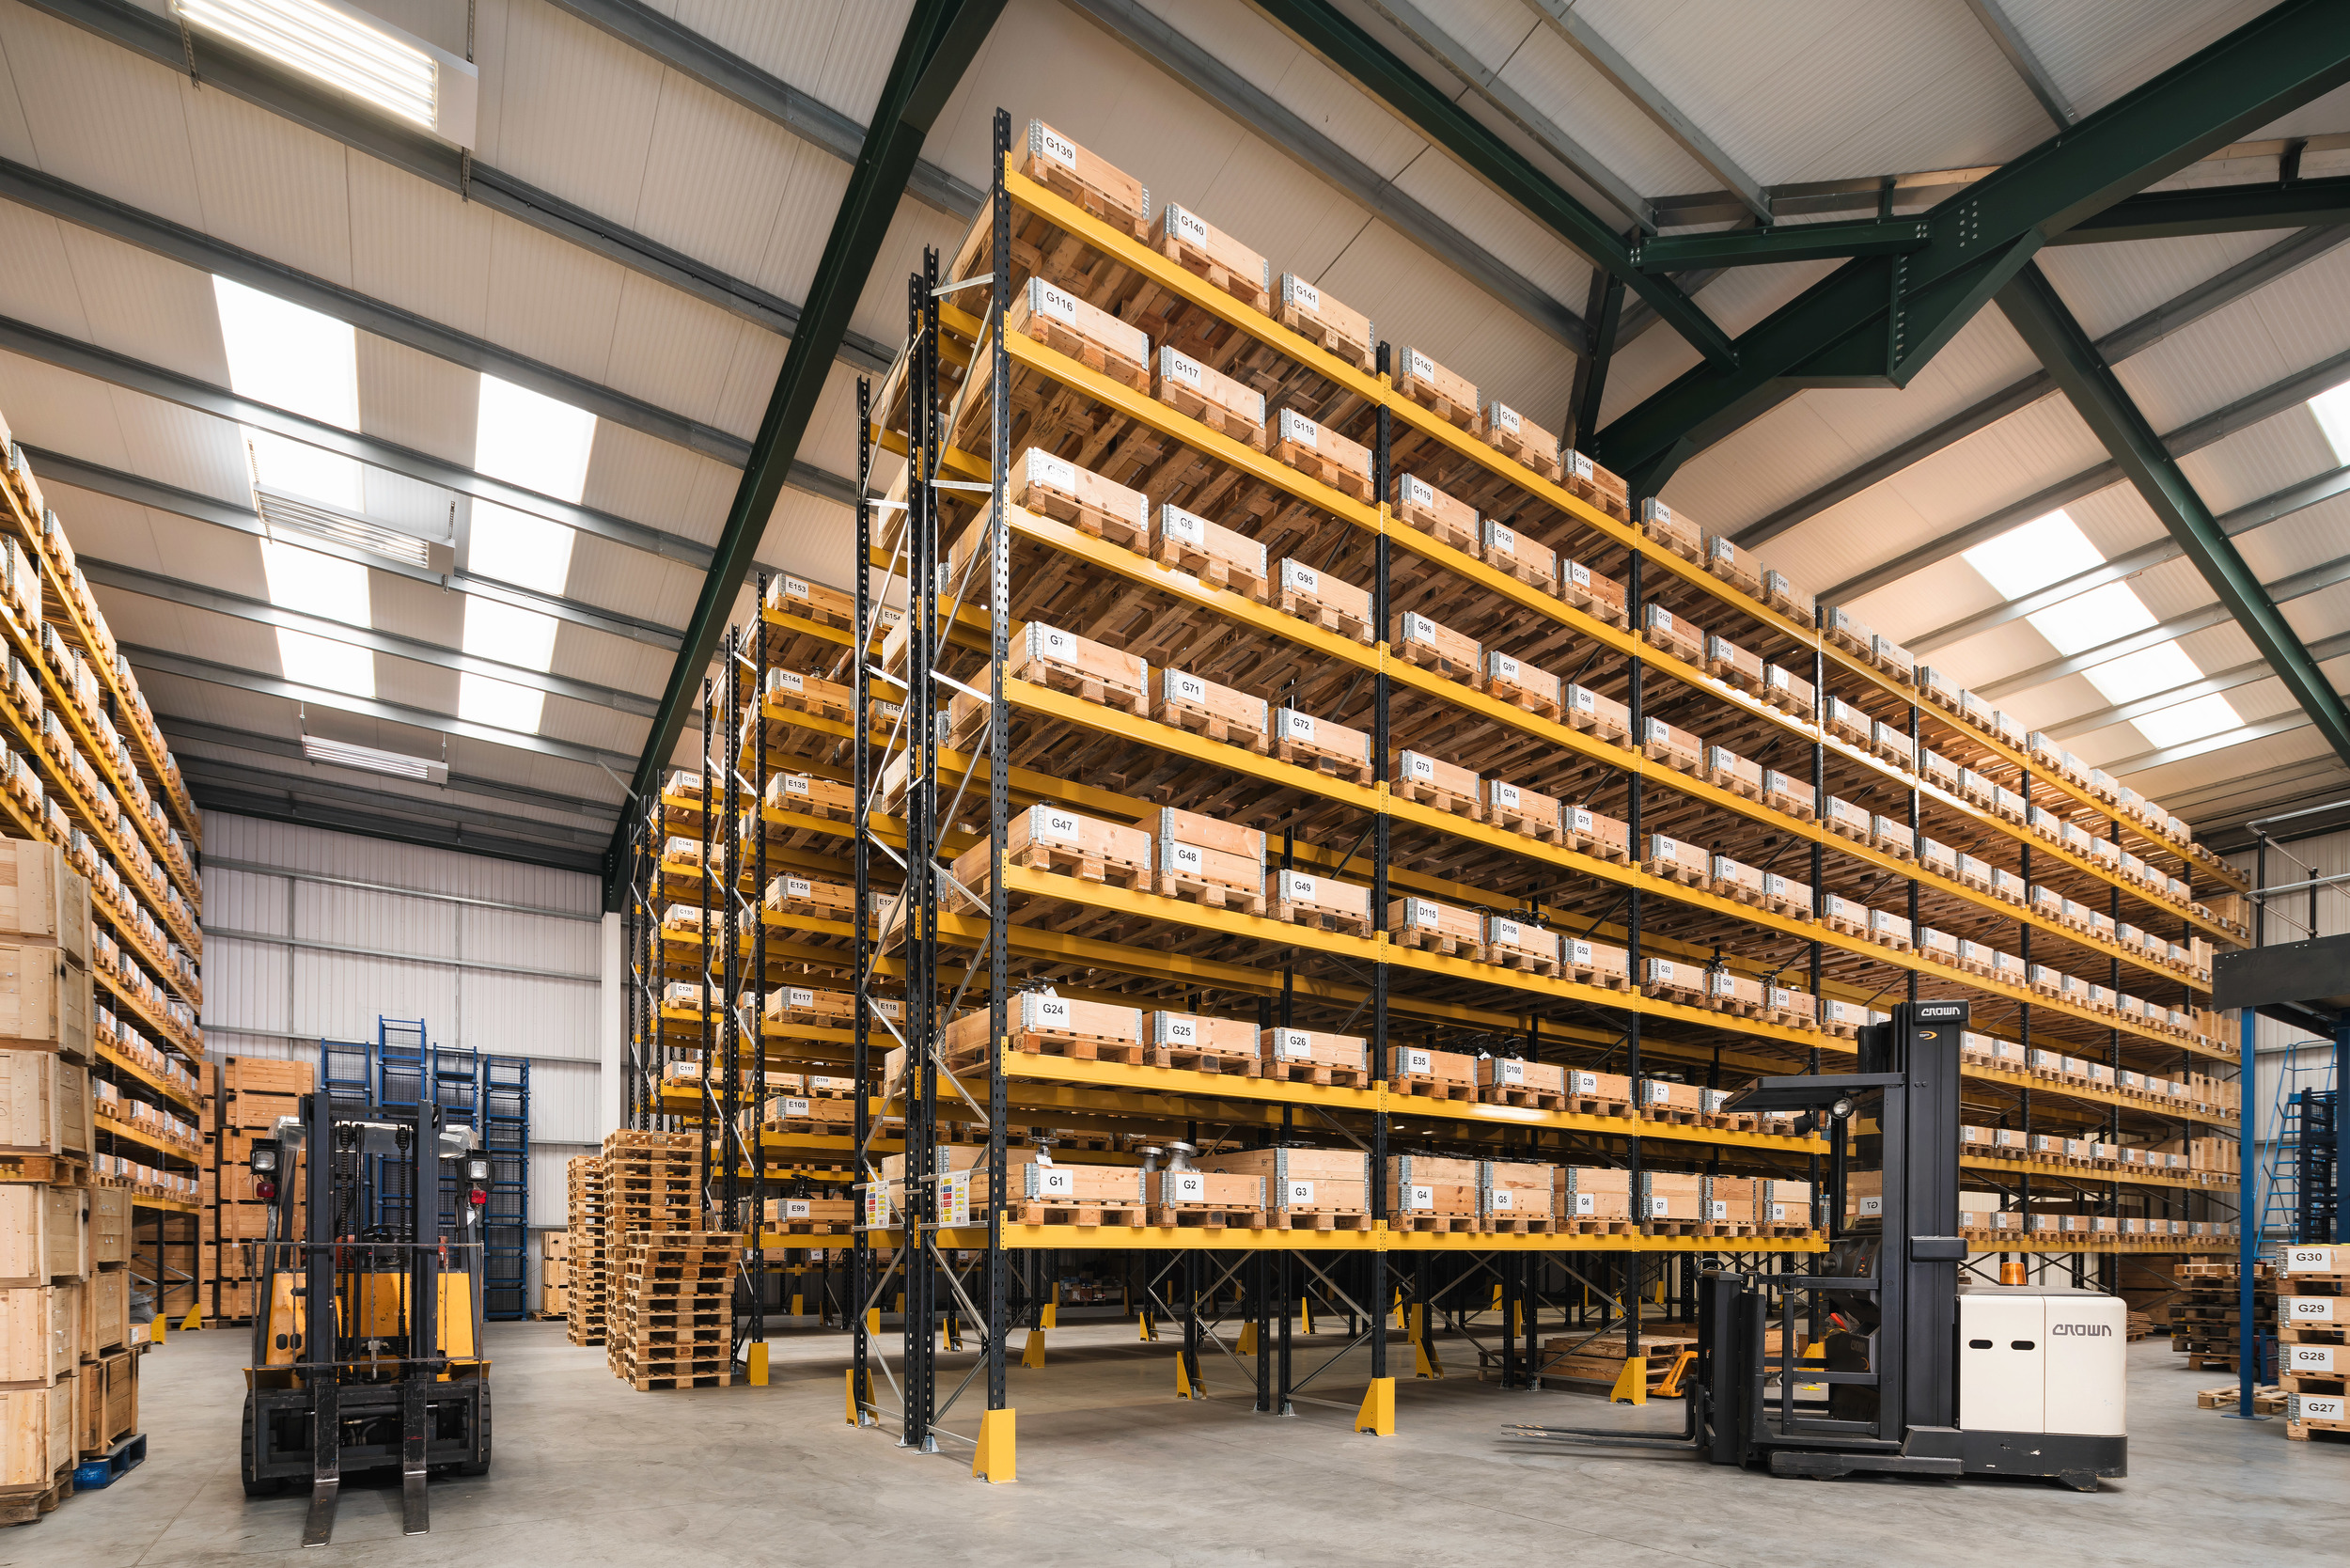 Warehouse Interior 1.jpg